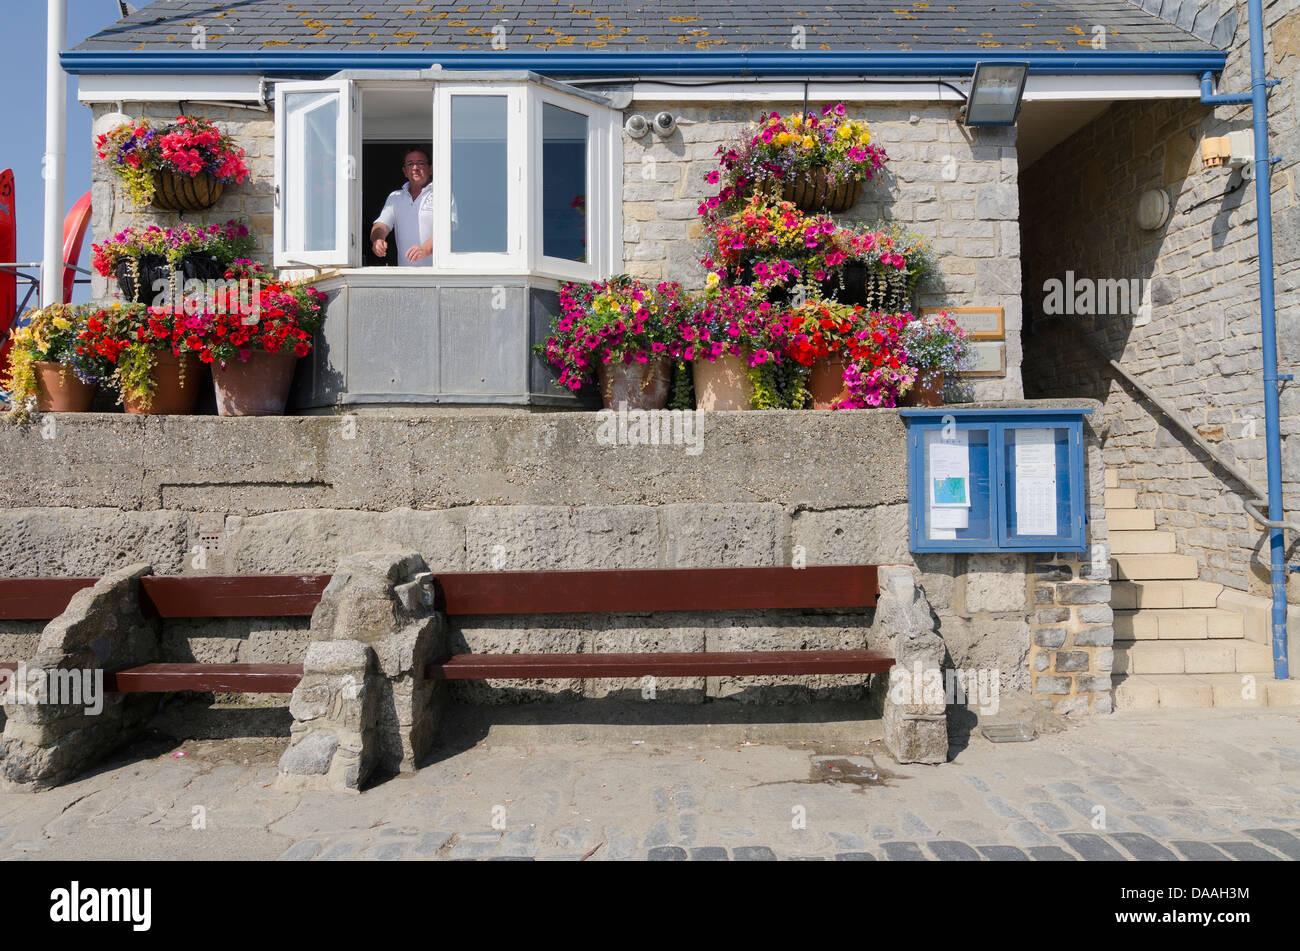 Harbourmaster's Office Lyme Regis Dorset UK - Stock Image